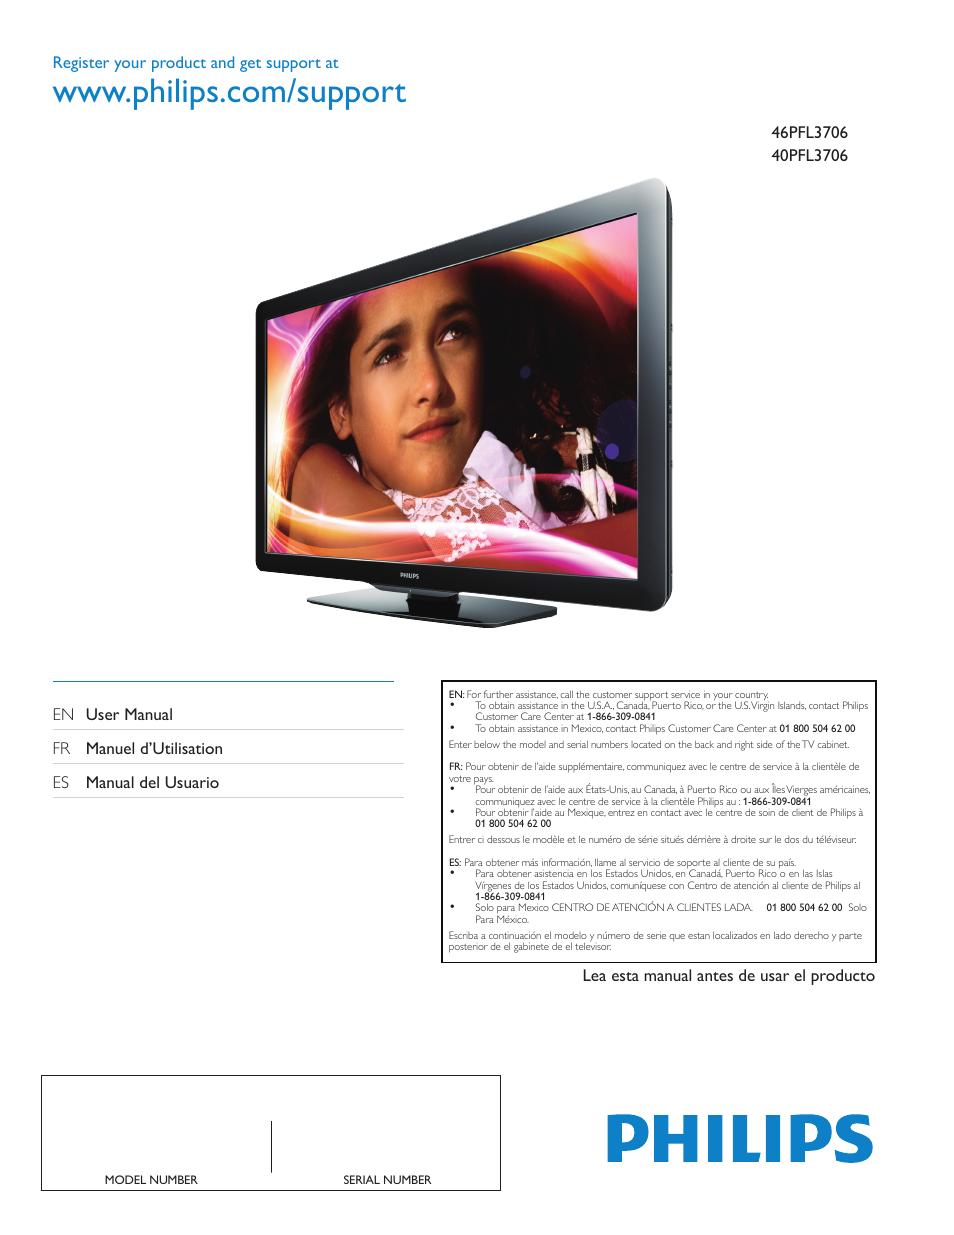 philips 46pfl3706 f7 user manual 36 pages original mode also rh manualsdir com Philips Universal Remote User Manual Philips Flat TV Manual